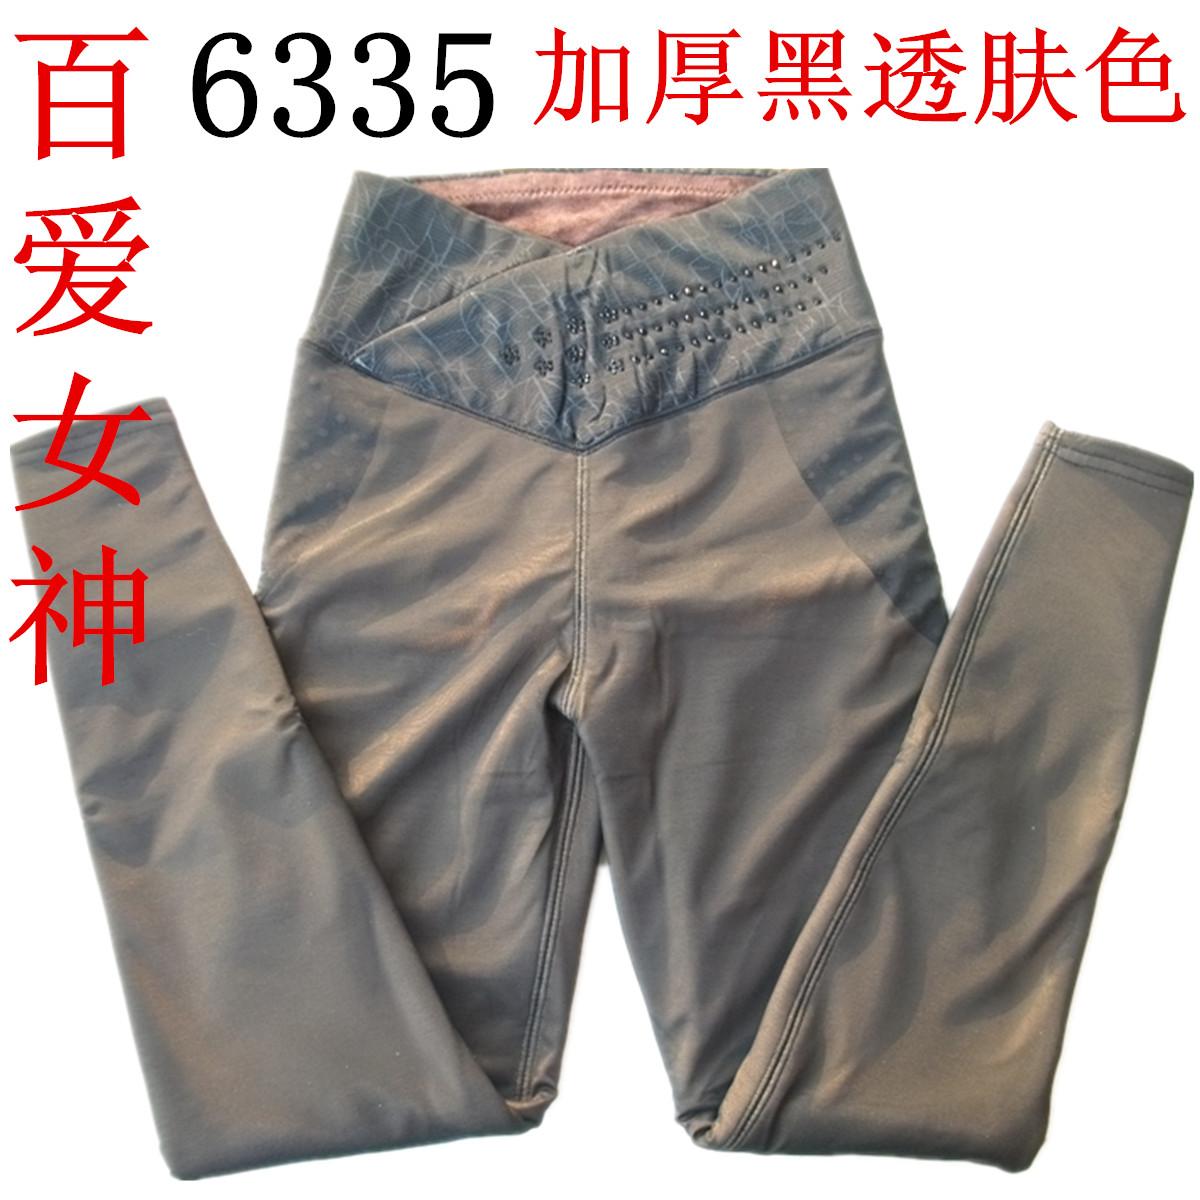 Pantalon collant LOVE GODDESS B6168 en nylon - Ref 756244 Image 3